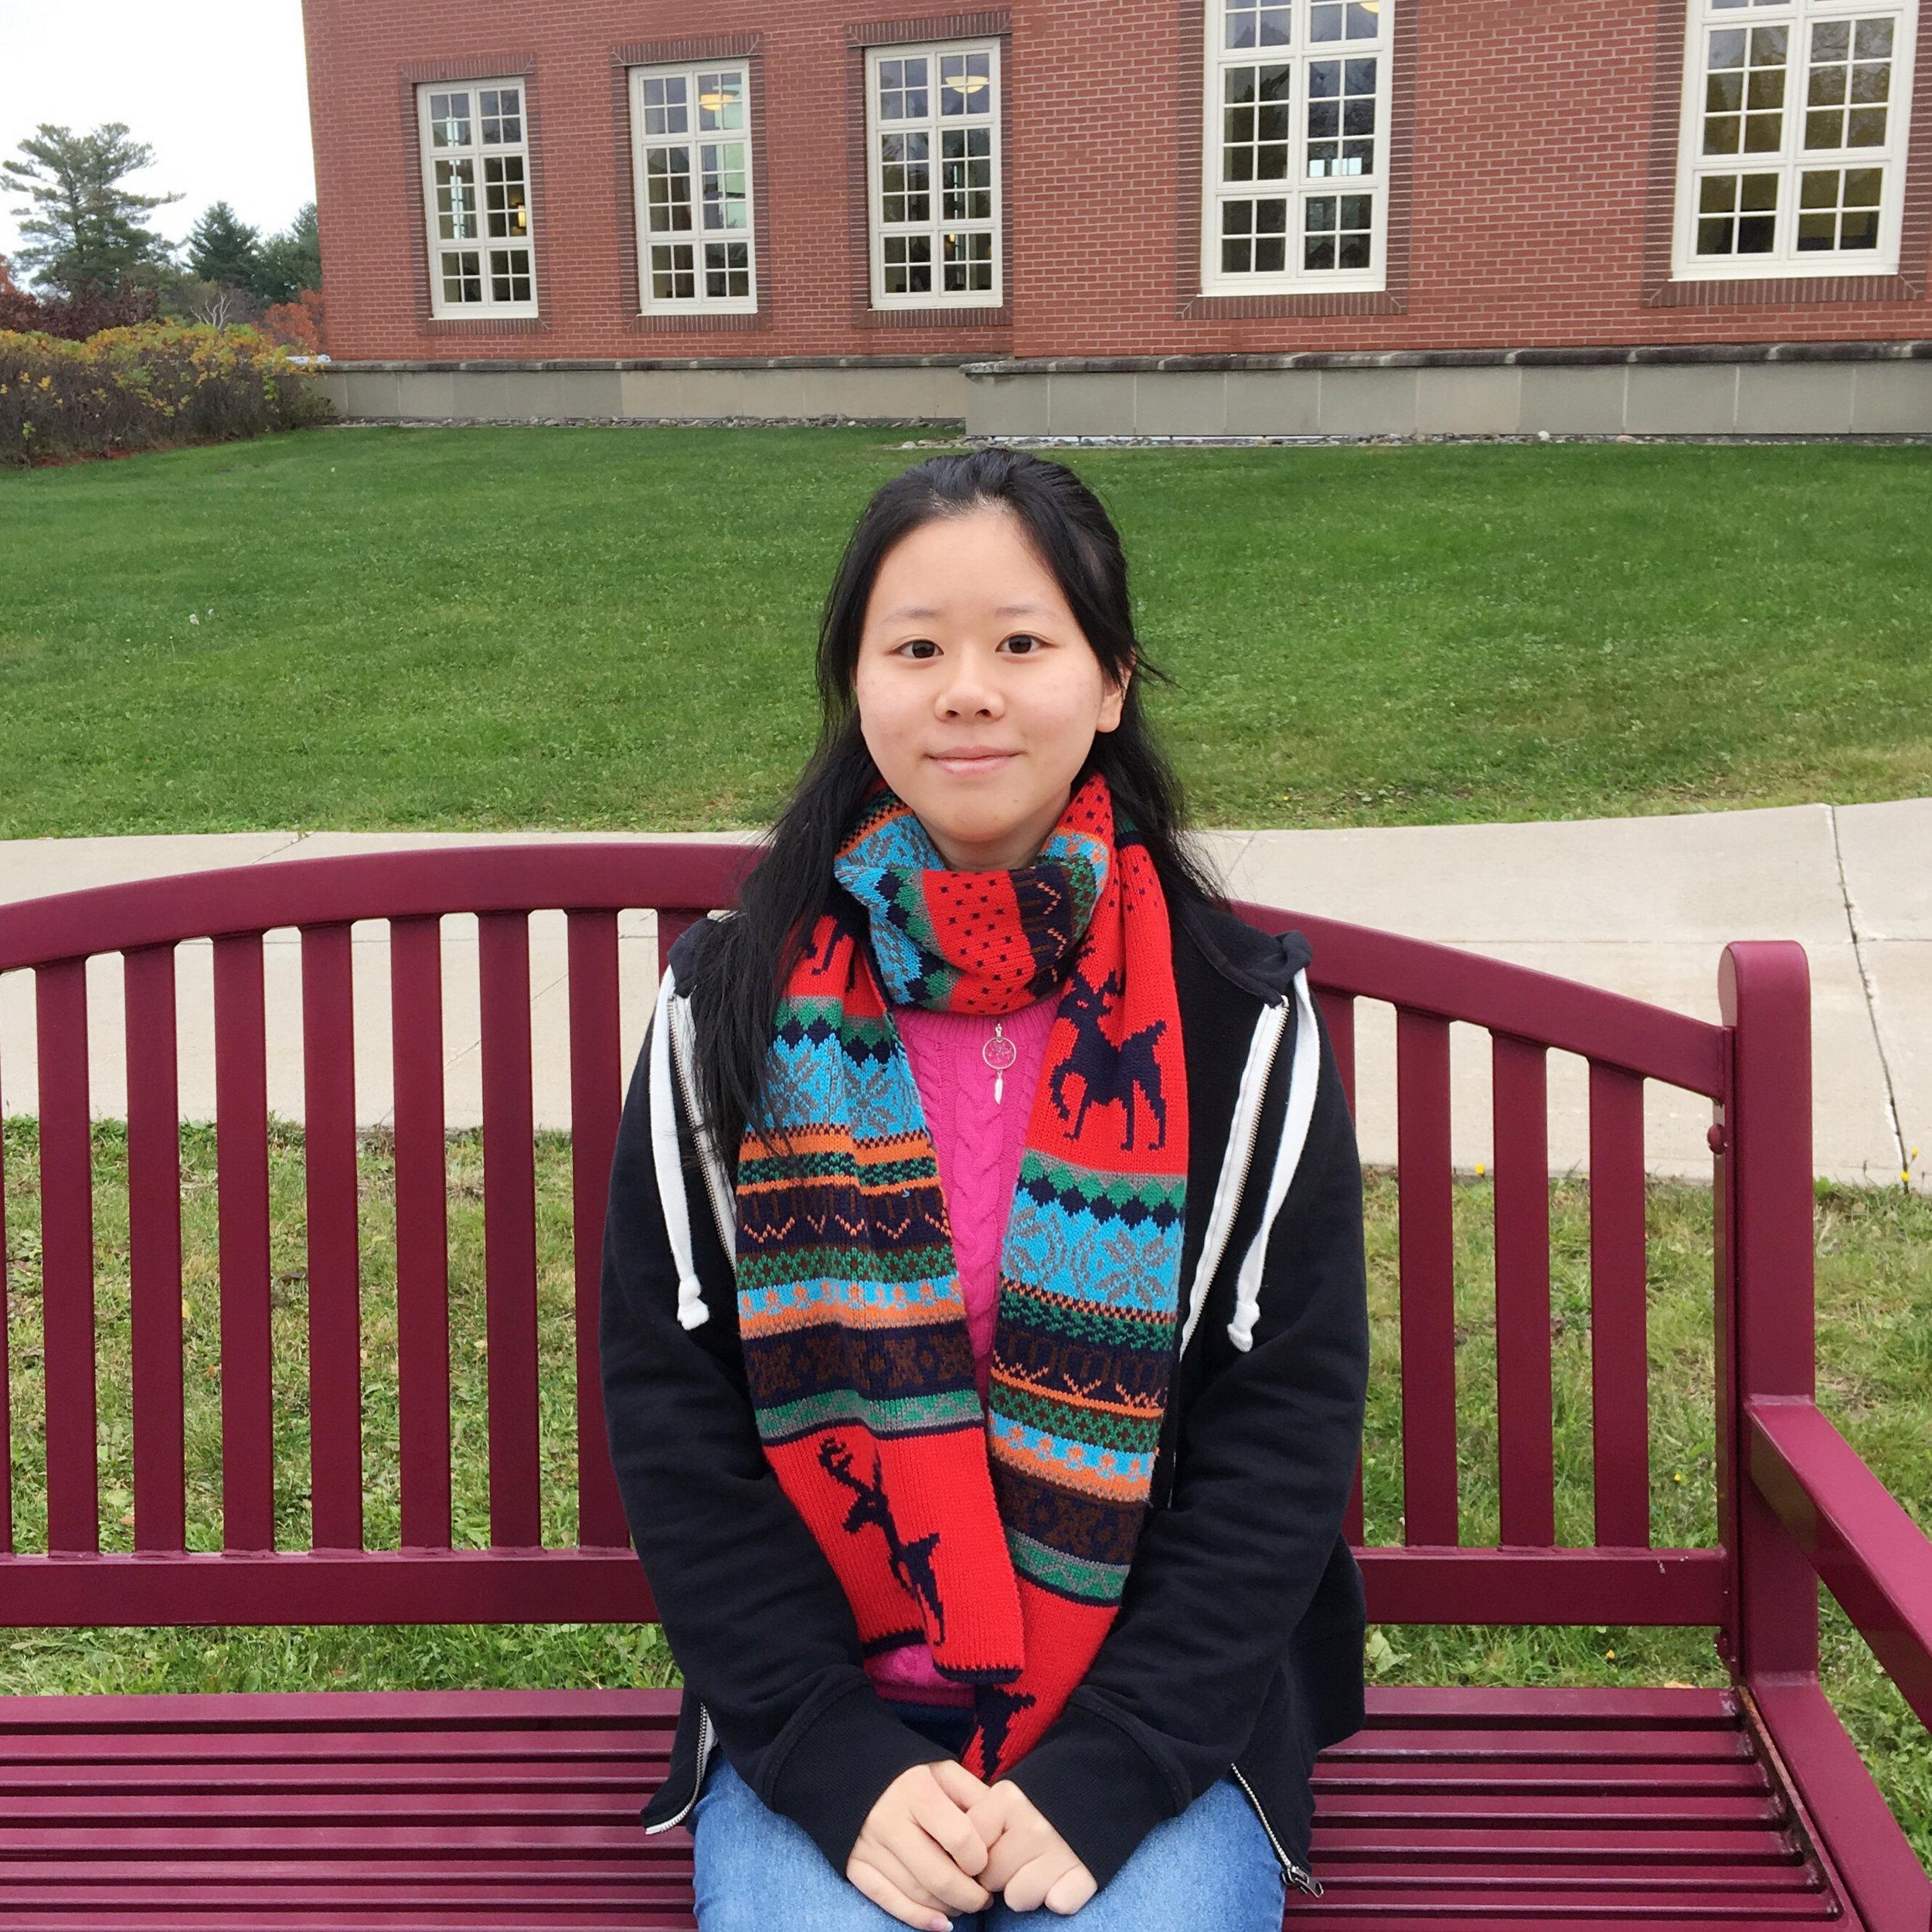 Asteria (Xue'er) Wang from Chengdu, China   St. Thomas University Class of 2020